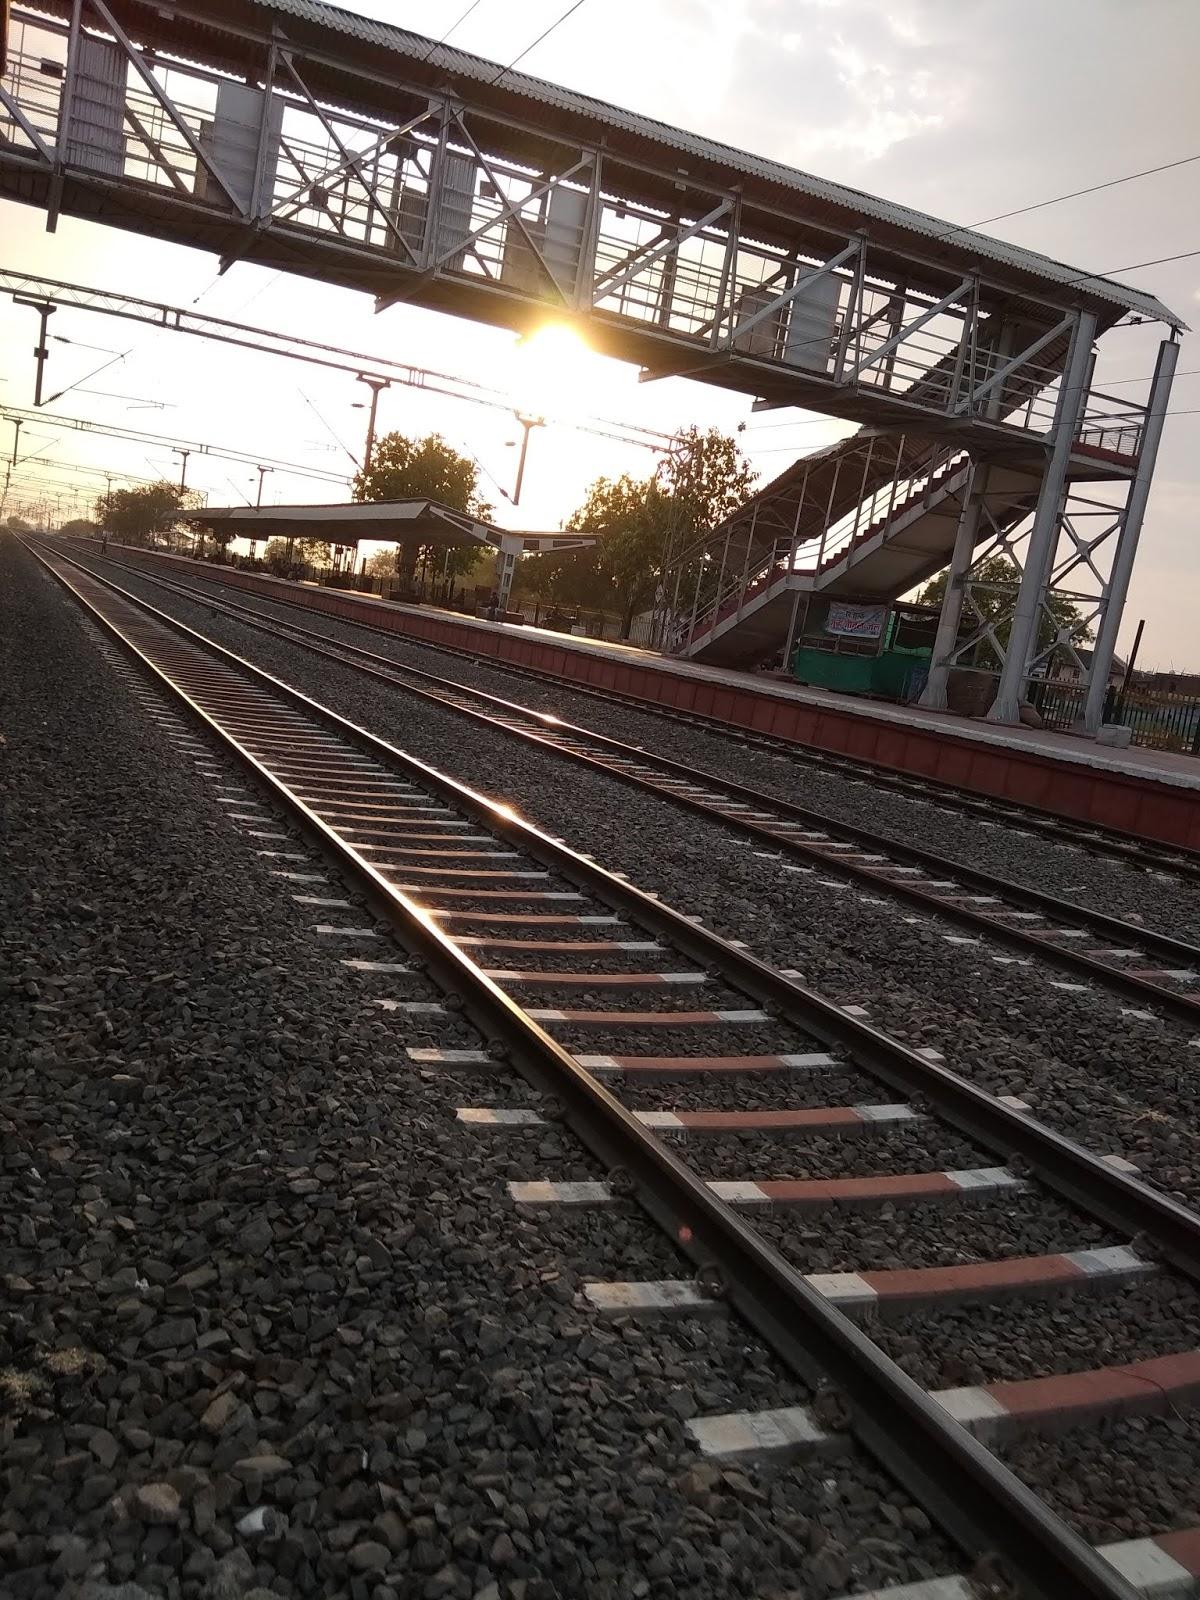 Indian railway Tracks, railway station, tracks, track, rail , rails , railway, railways, patri, train , trains , tracks, photography, photoshoot